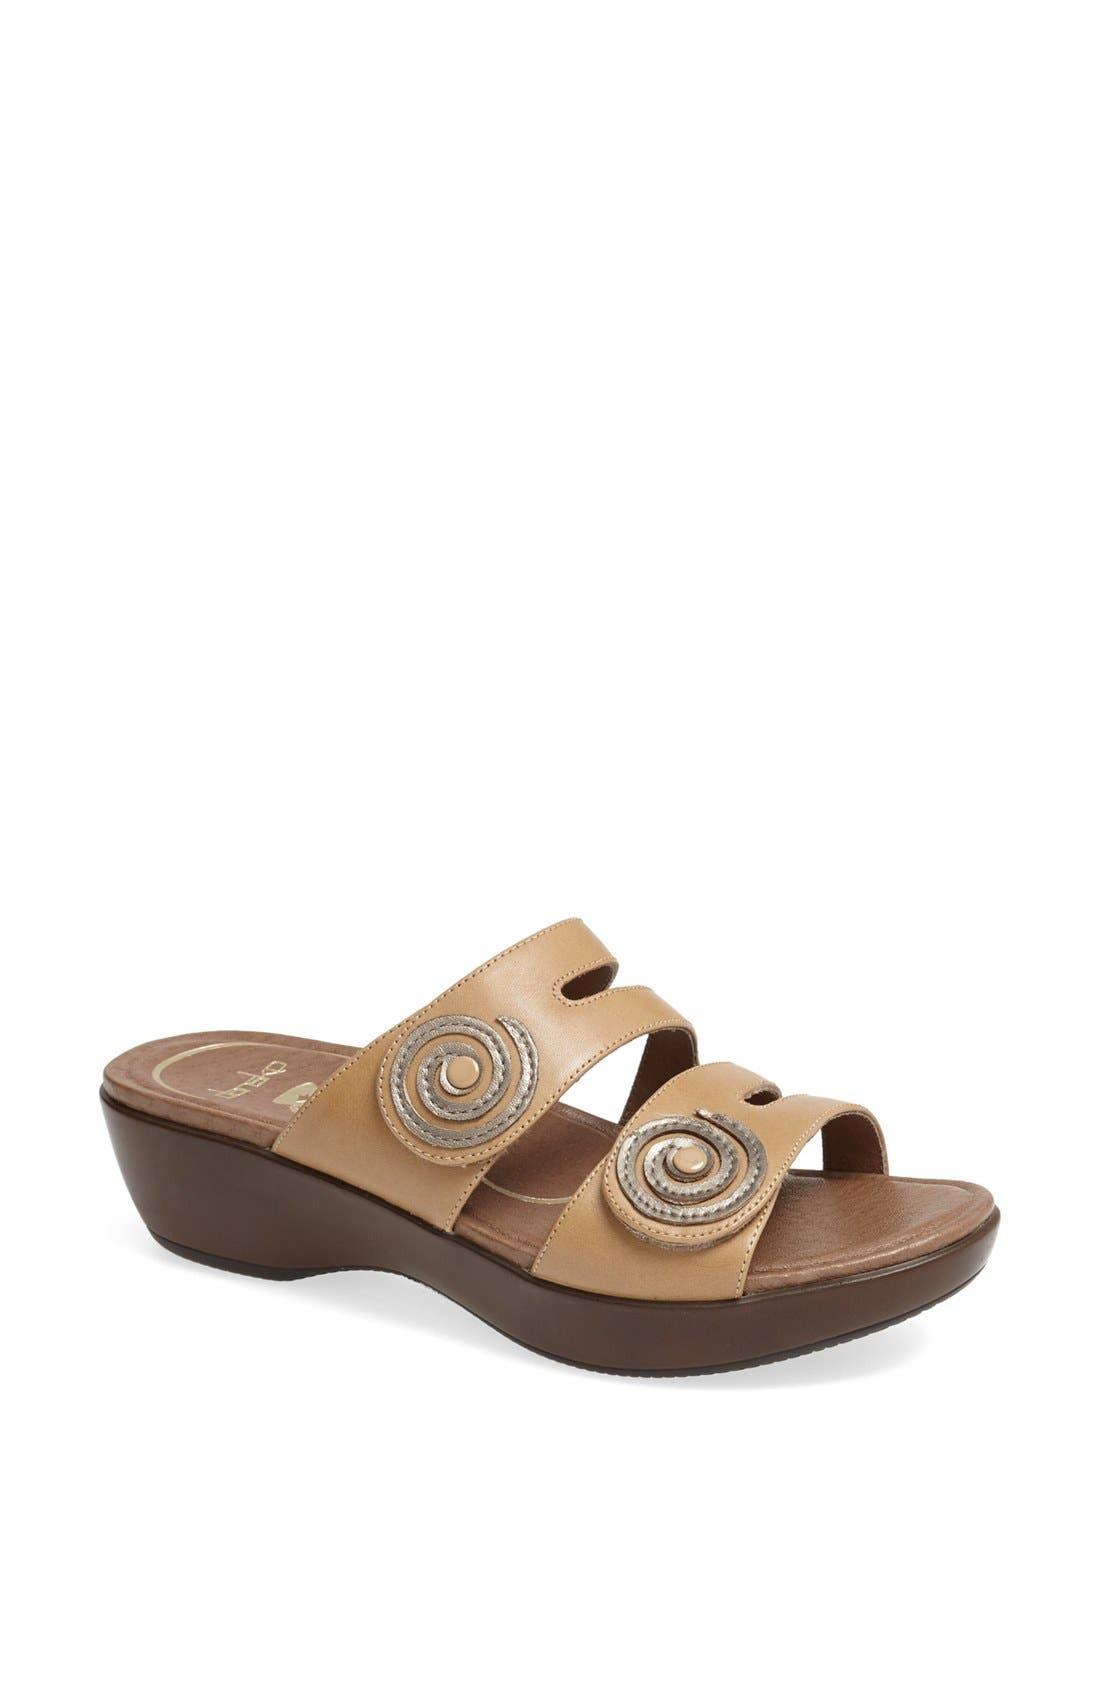 Alternate Image 1 Selected - Dansko 'Dixie' Sandal